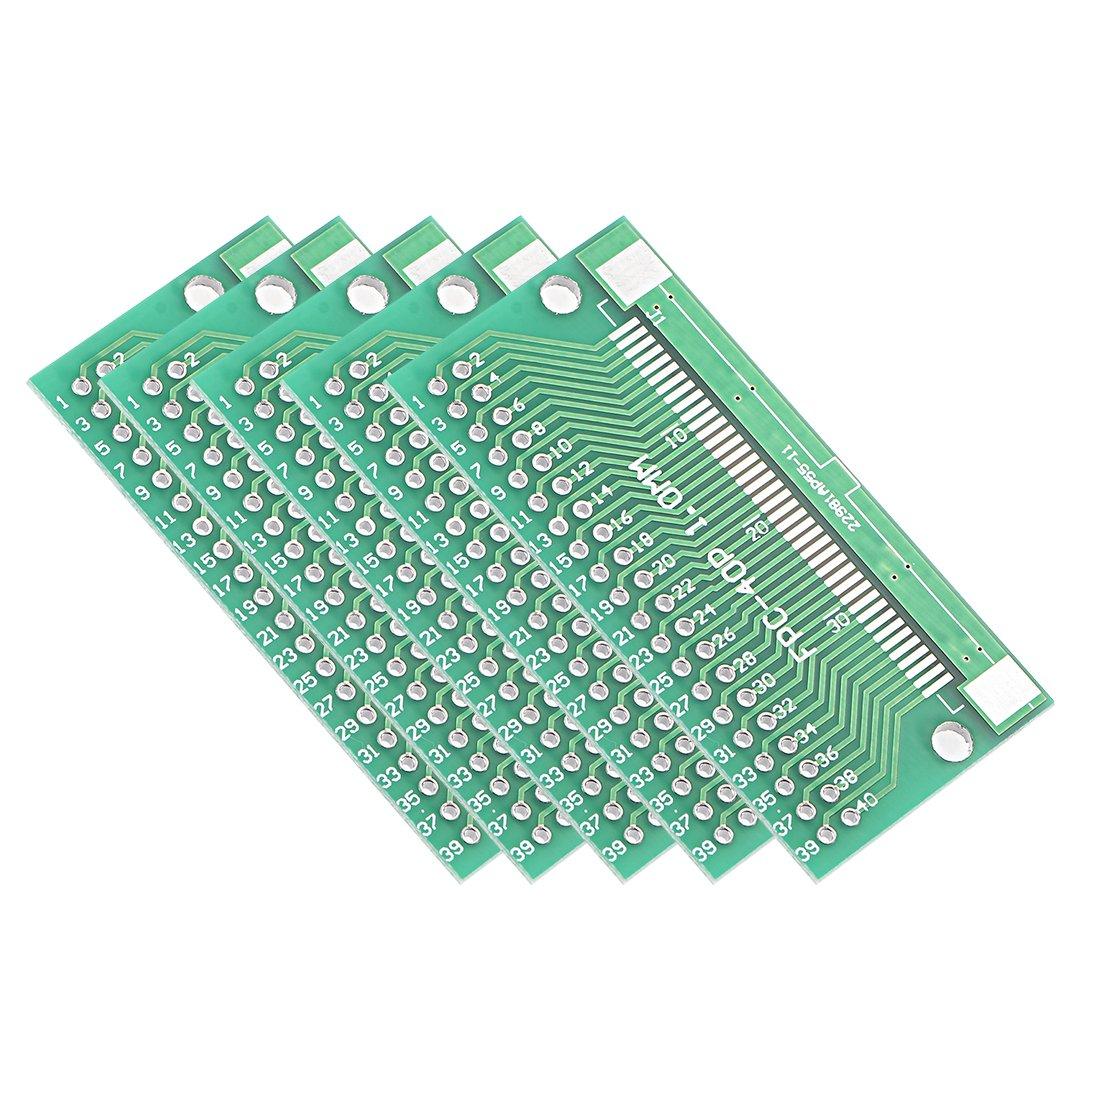 "8Pcs 54 x 26mm//2.1/"" x 1/"" FPC 40Pins Adapter PCB Converter Board"